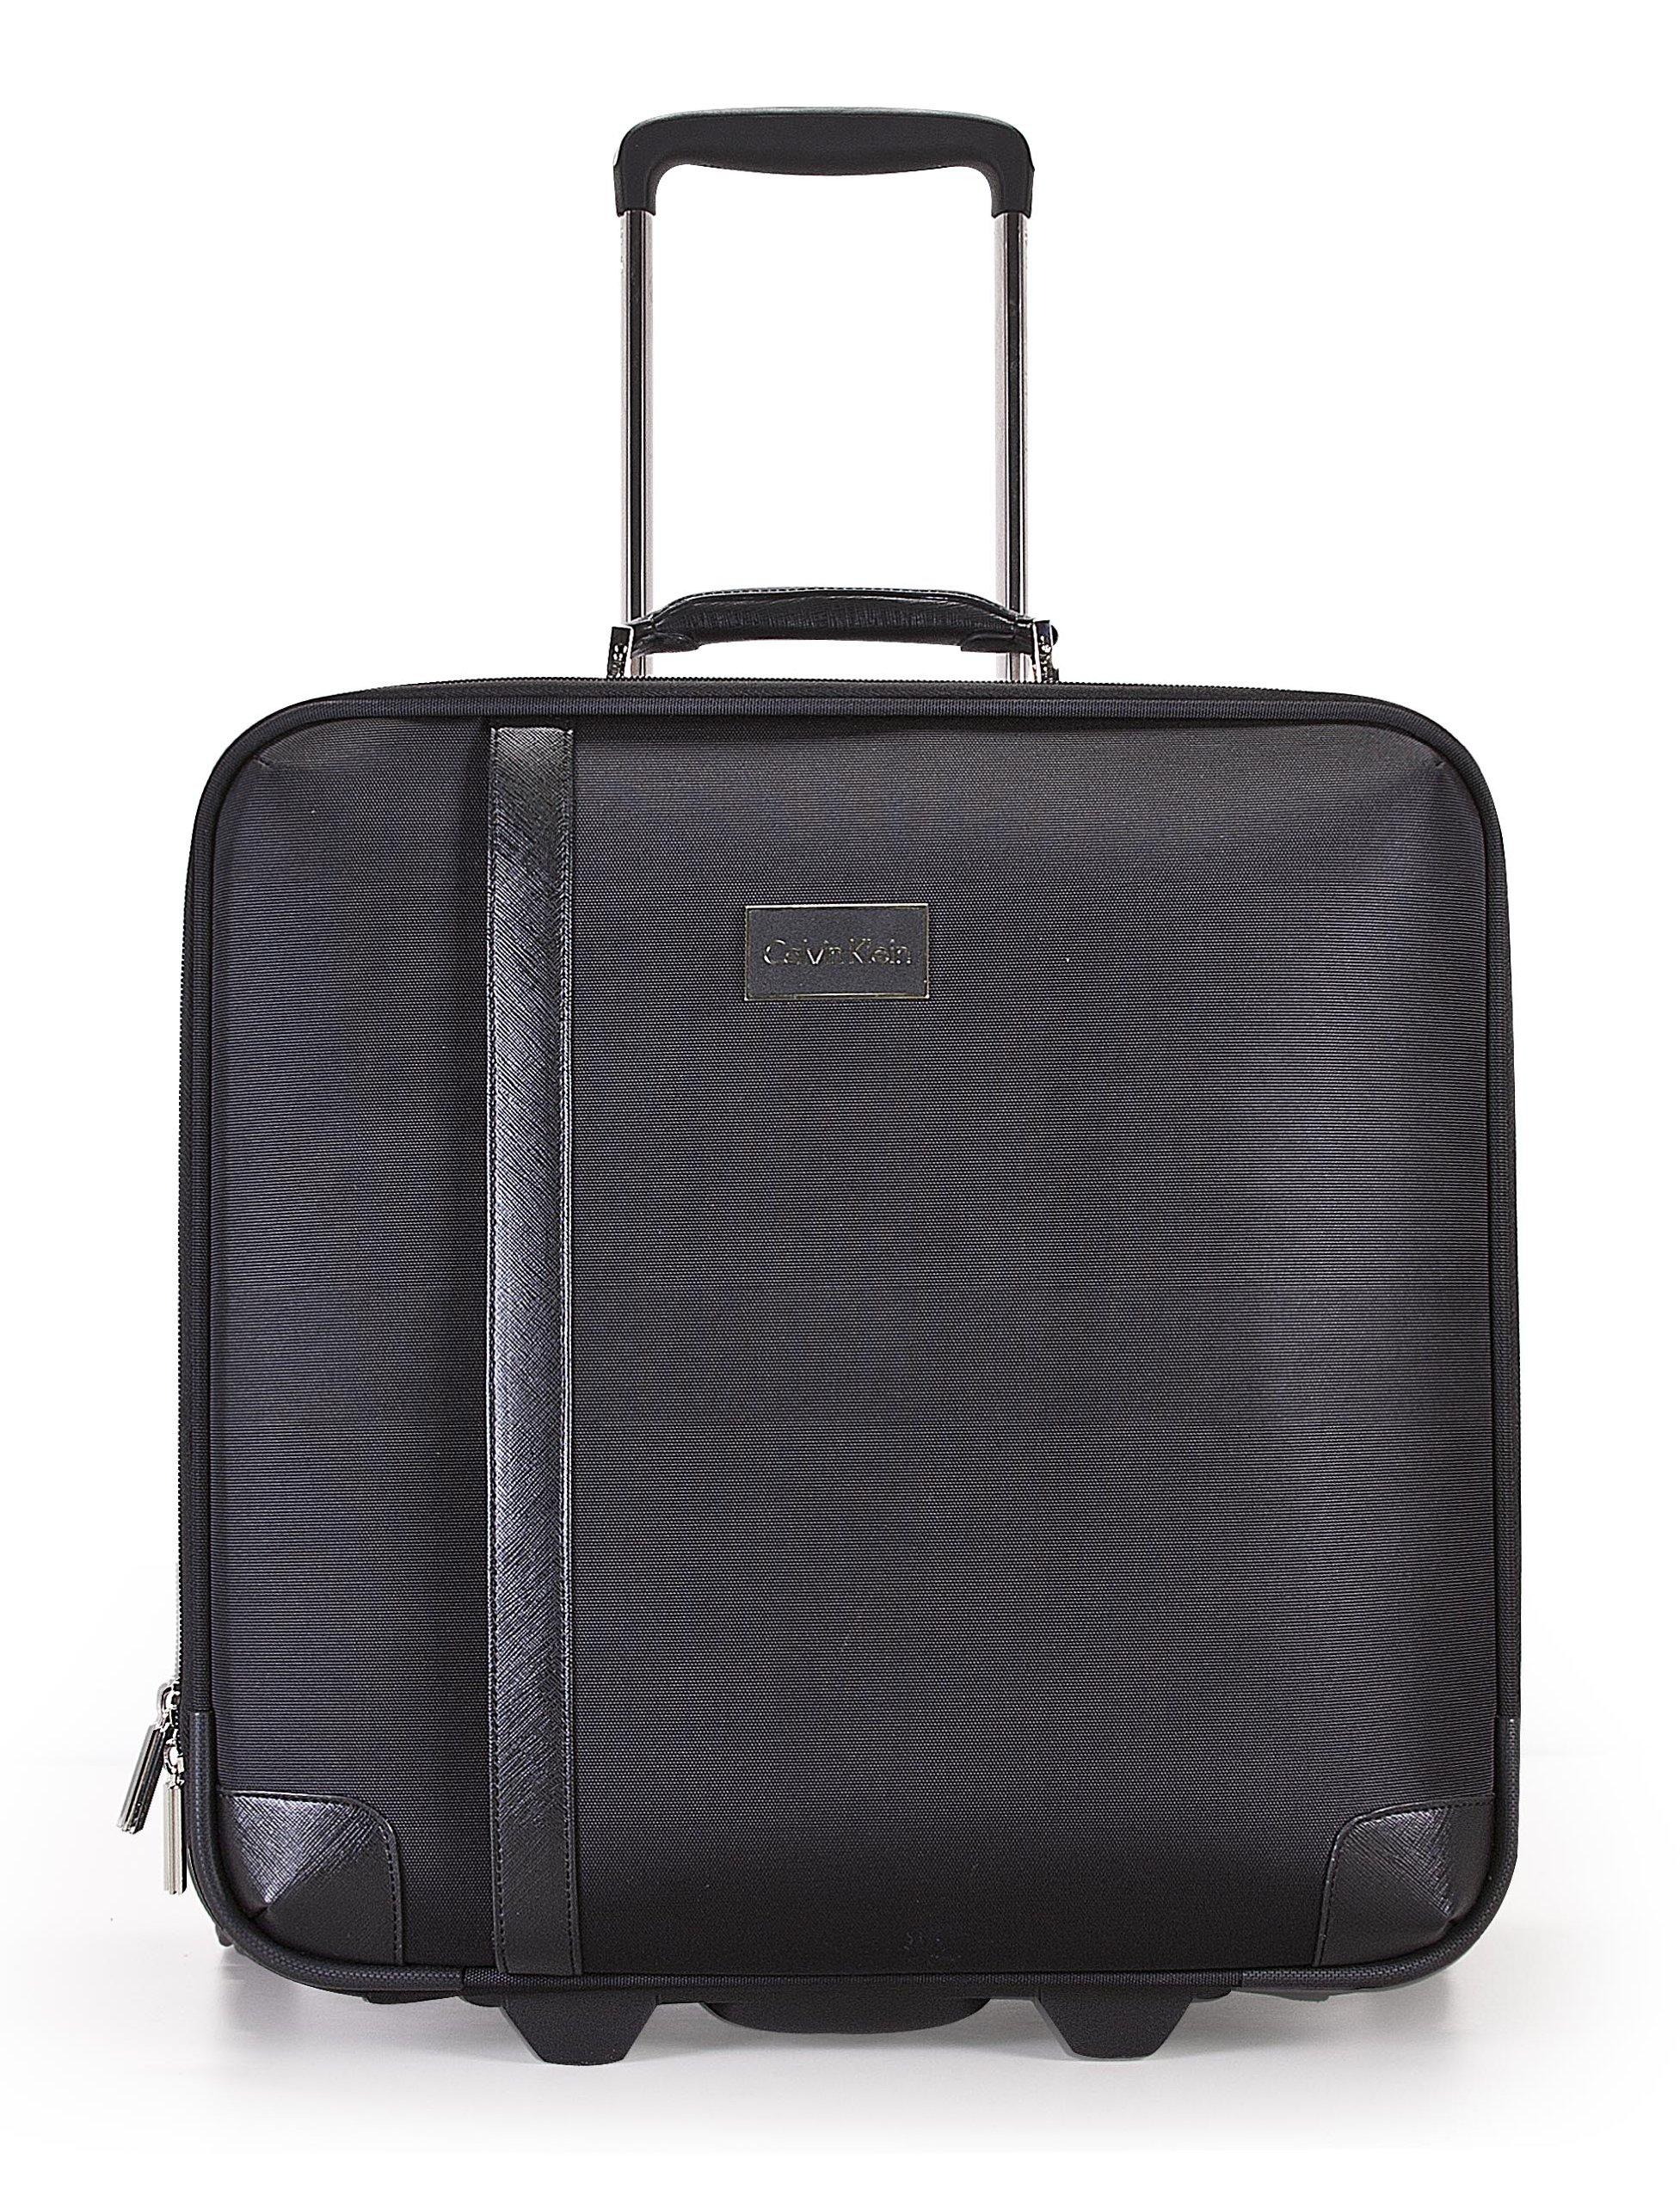 Calvin Klein Avalon 2.0 22'' Sleeve Garment Bag, black by Calvin Klein